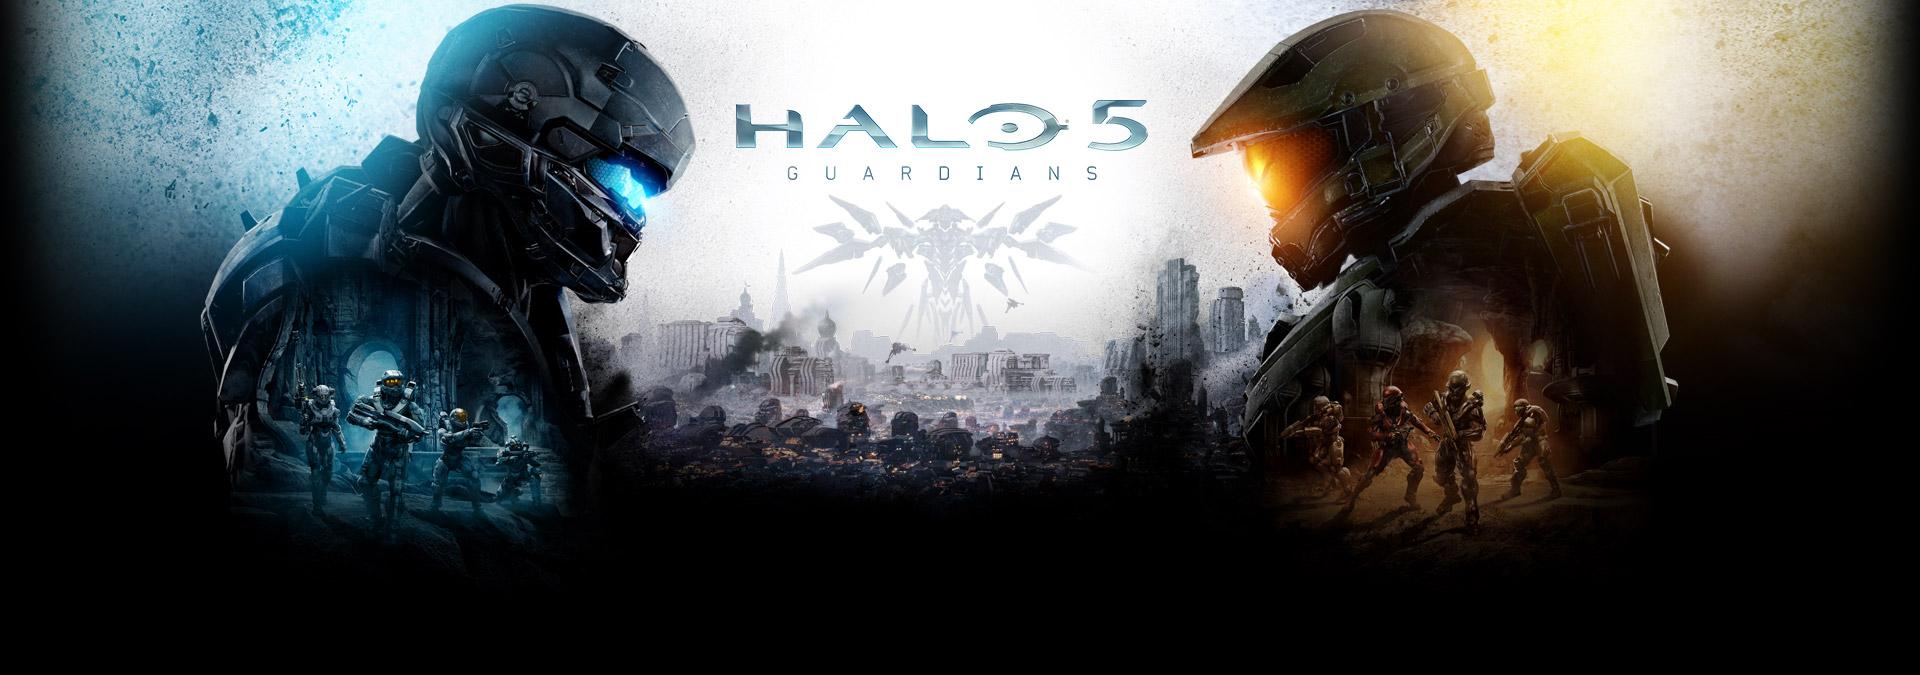 Halo 5 Xbox 360 Cover by LegendaryG7 on DeviantArt